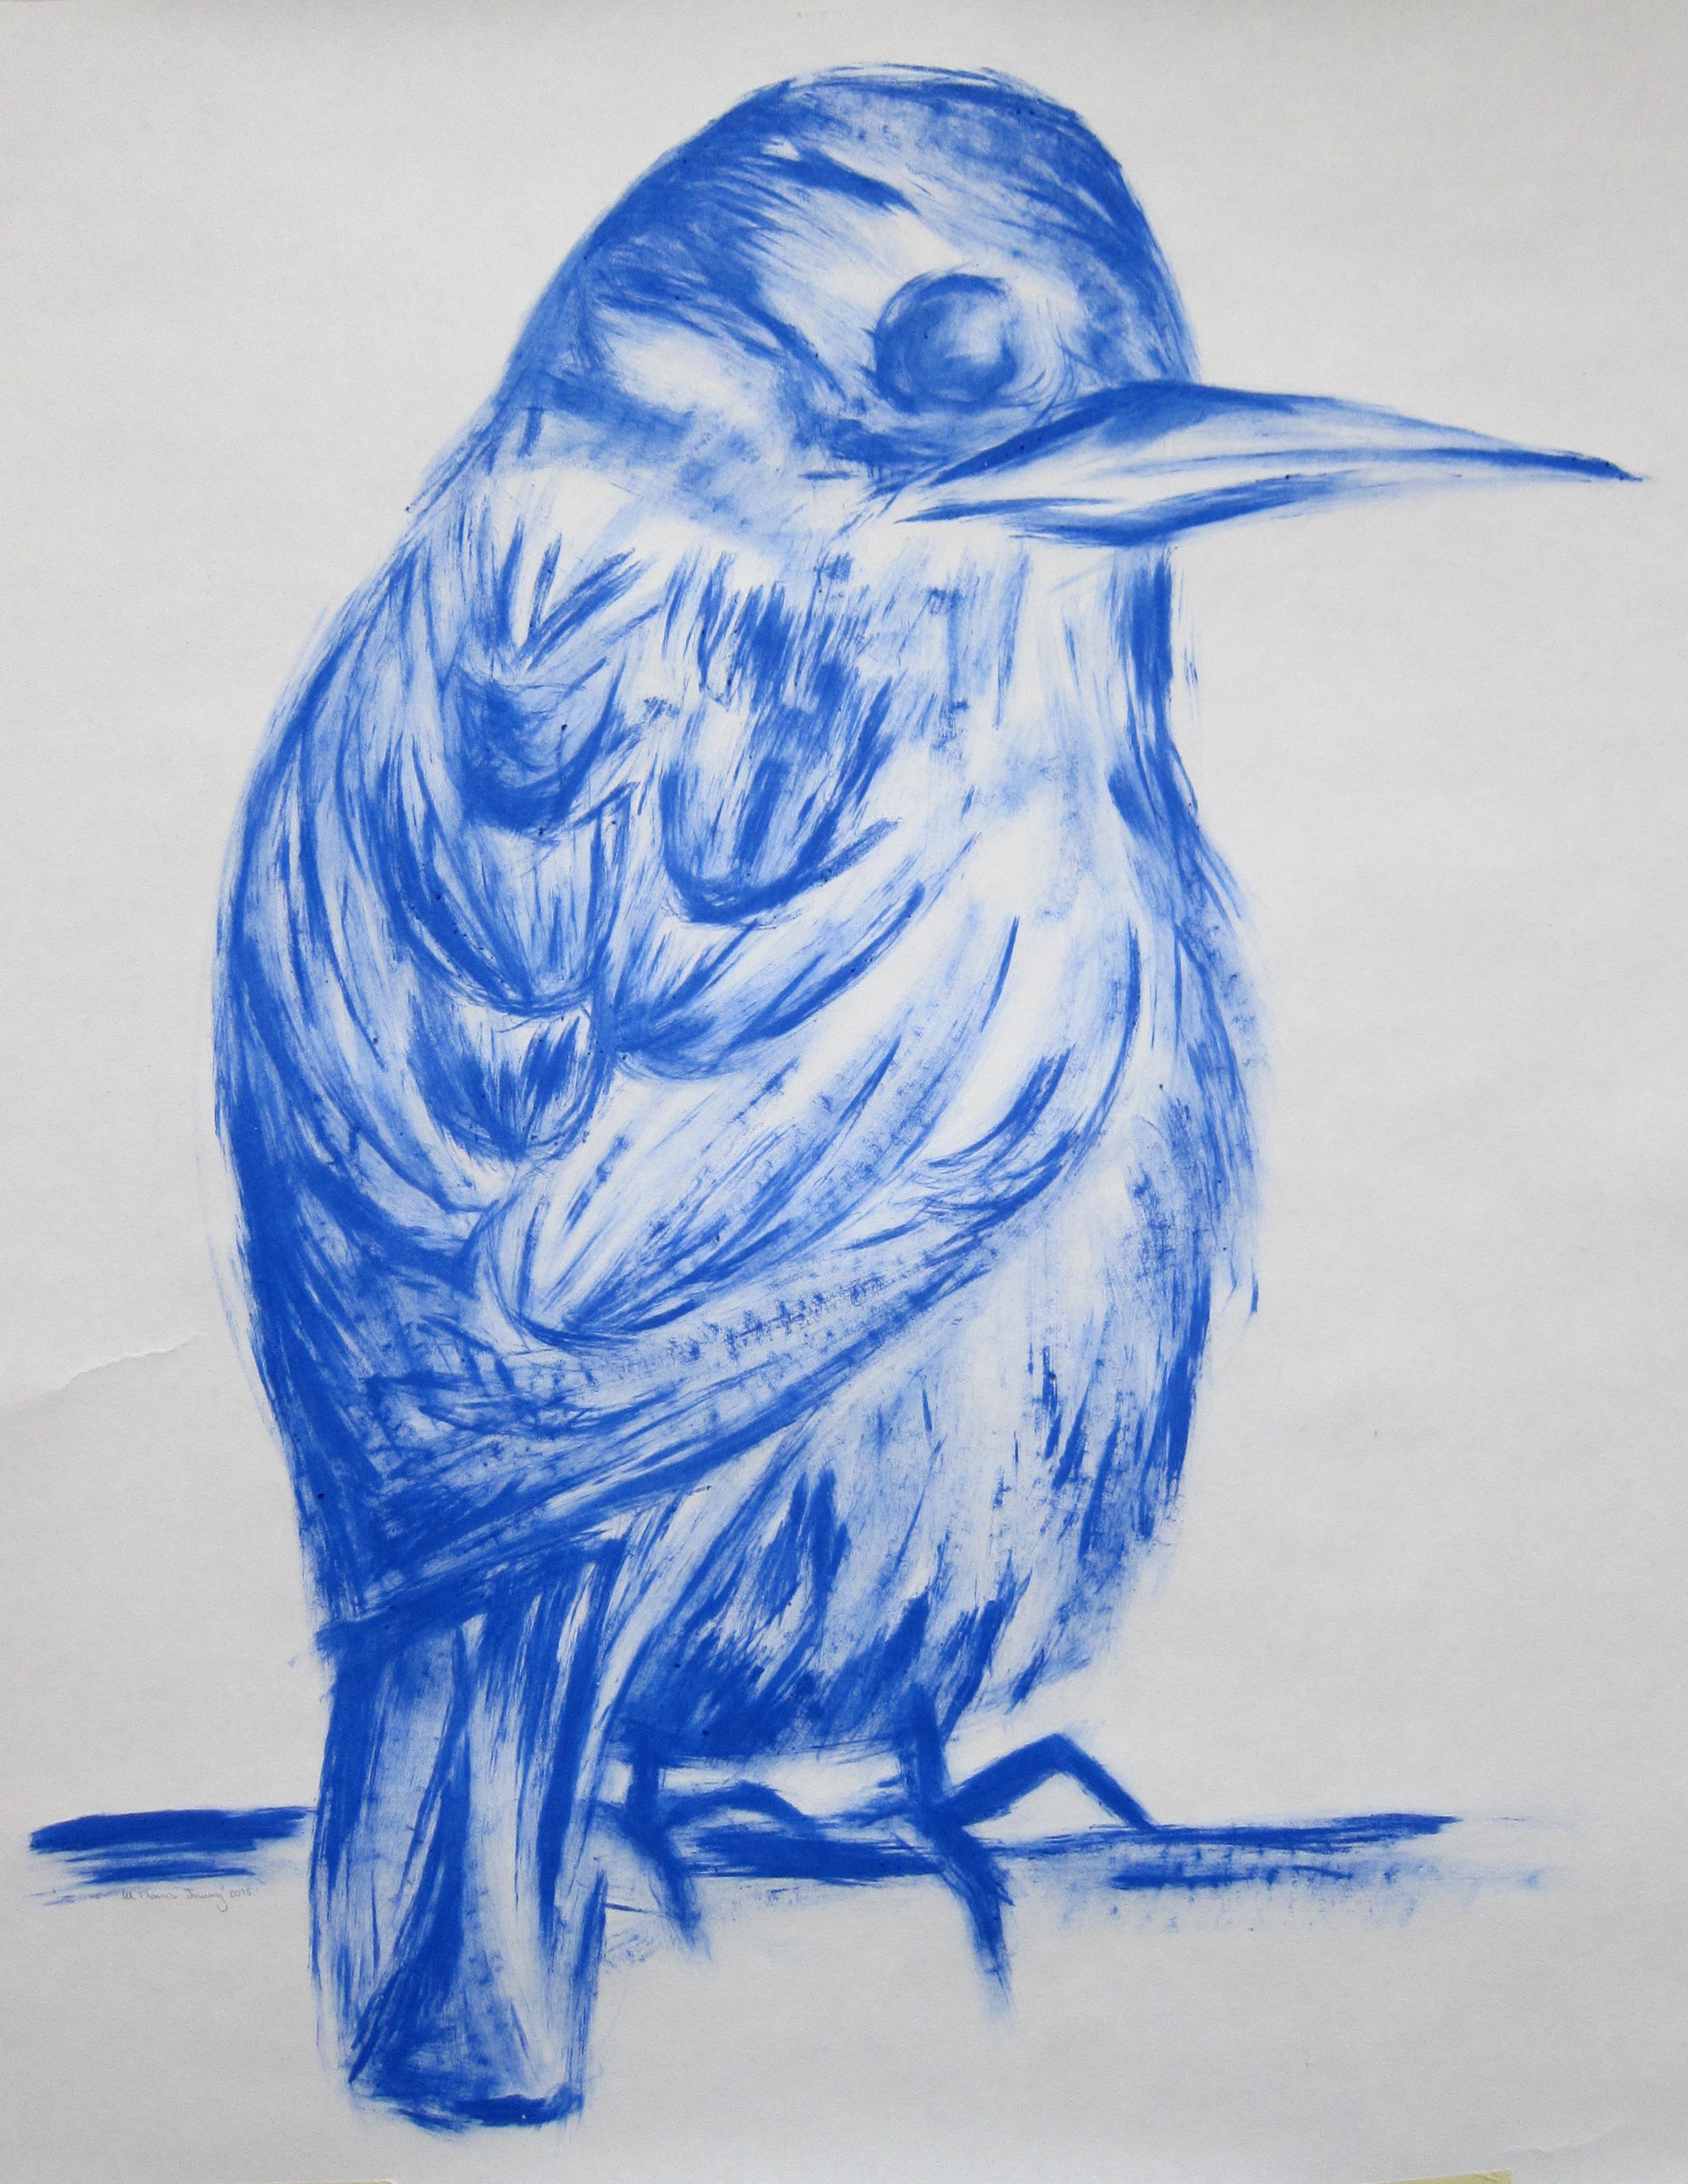 Fat bird Jan 2015 acrylic on paper 70x90.jpg